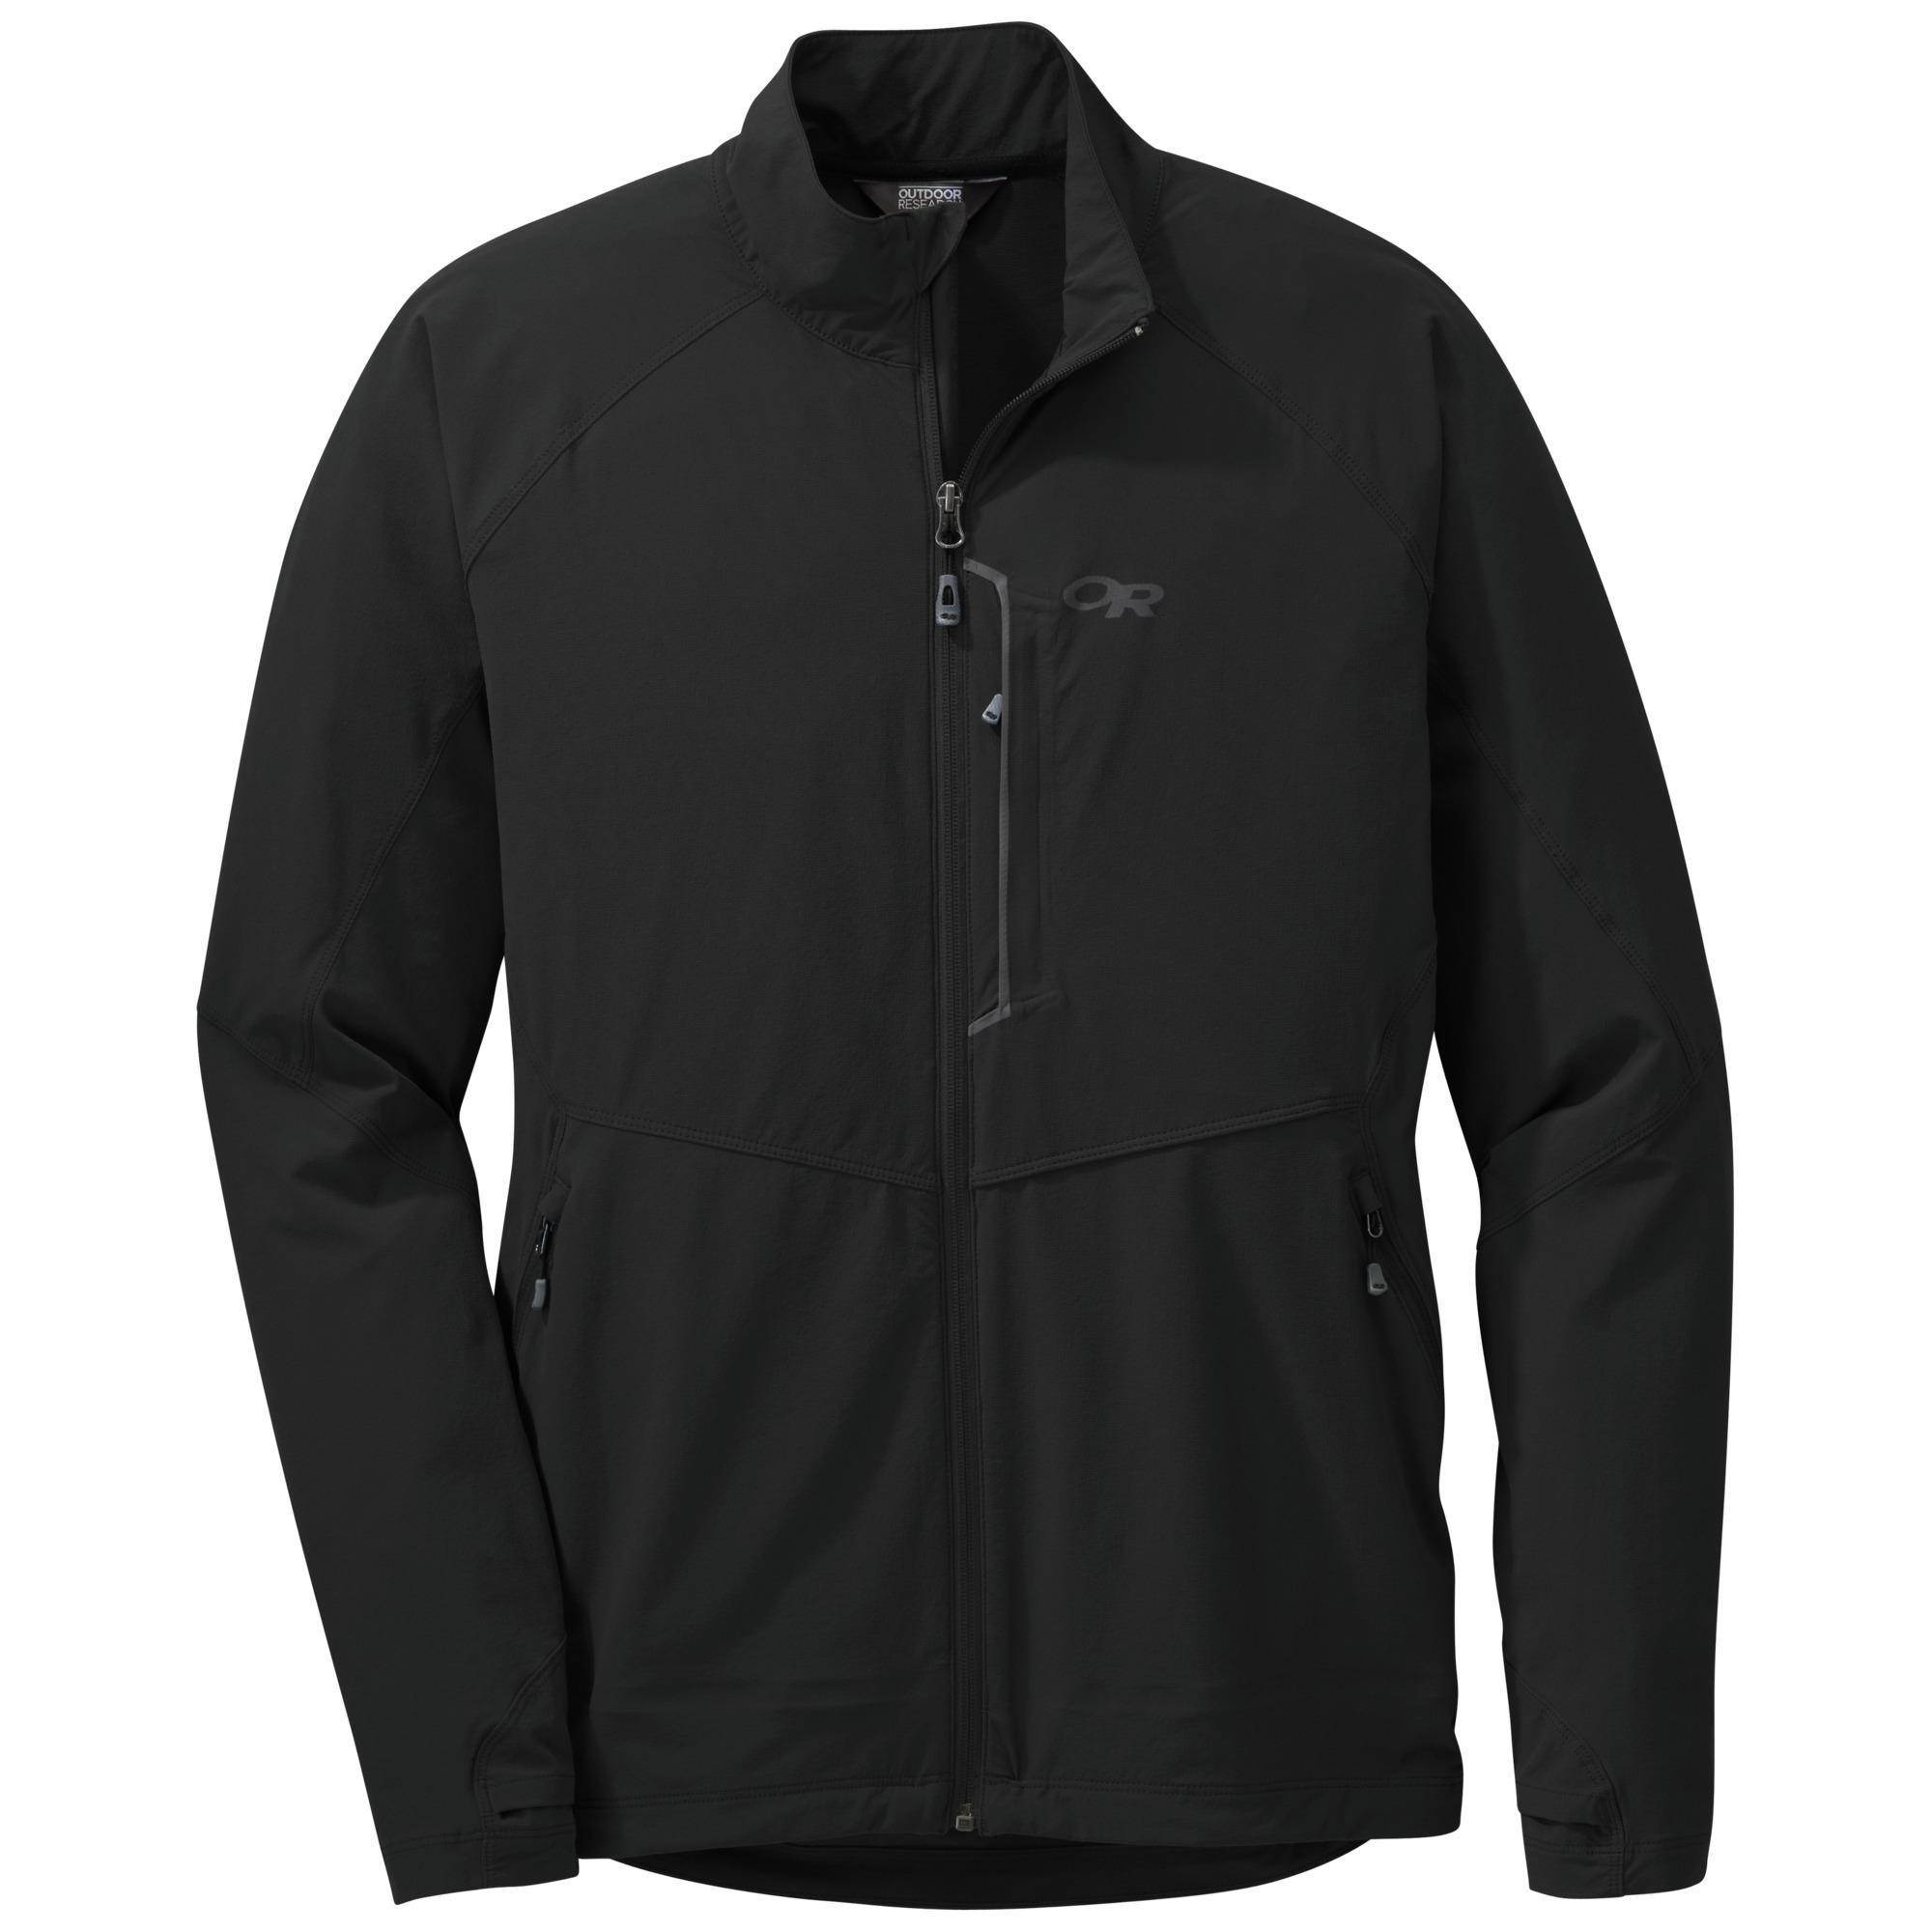 Outdoor Research Men's Ferrosi Jacket-black-XXL - Gr. XXL